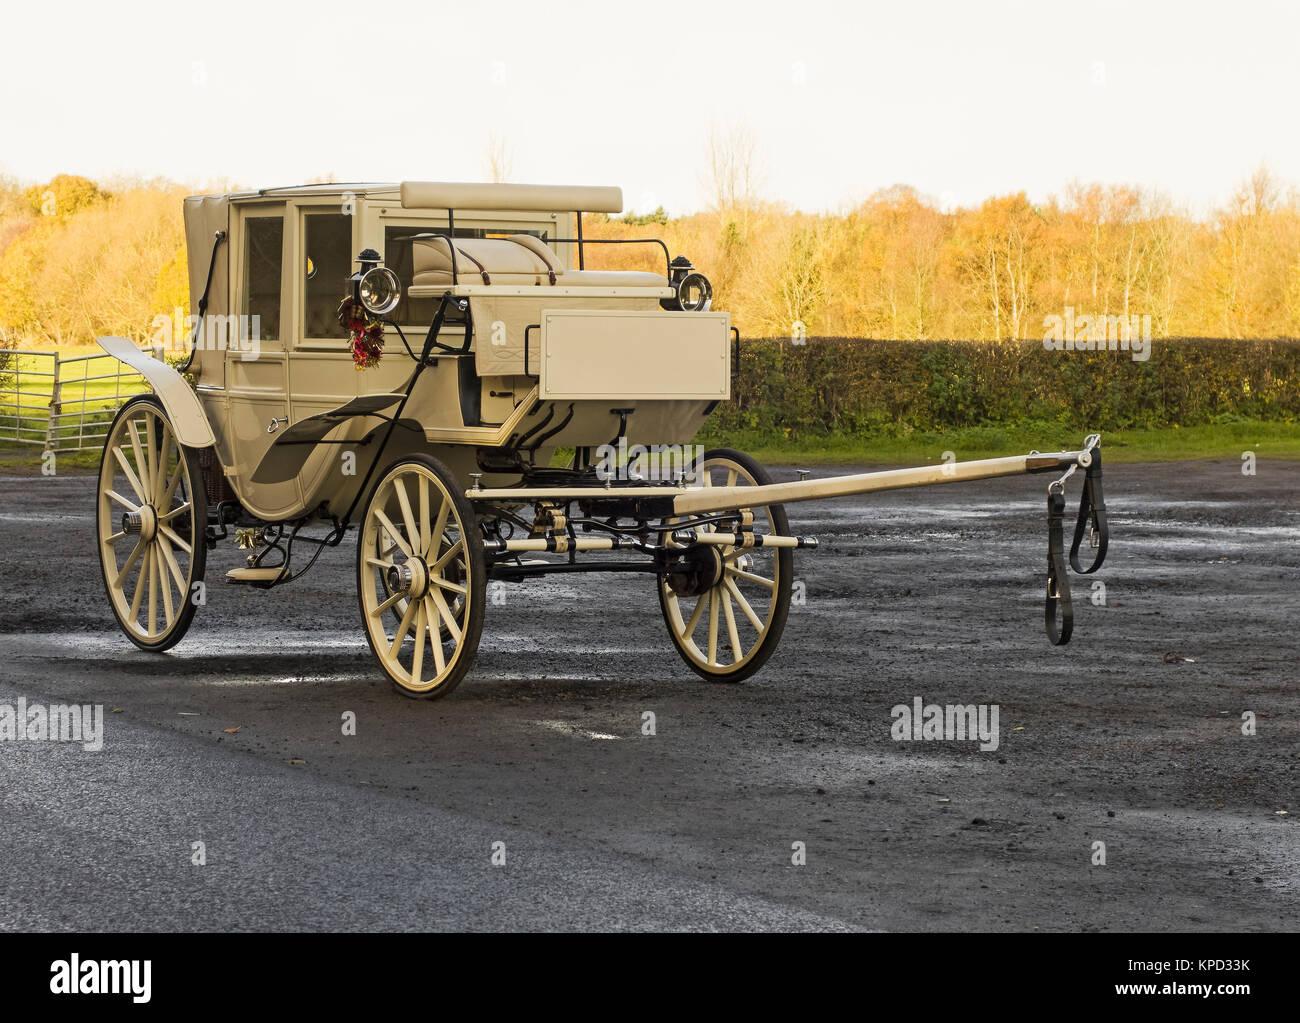 Horse drawn wedding carriage sans horse - Stock Image